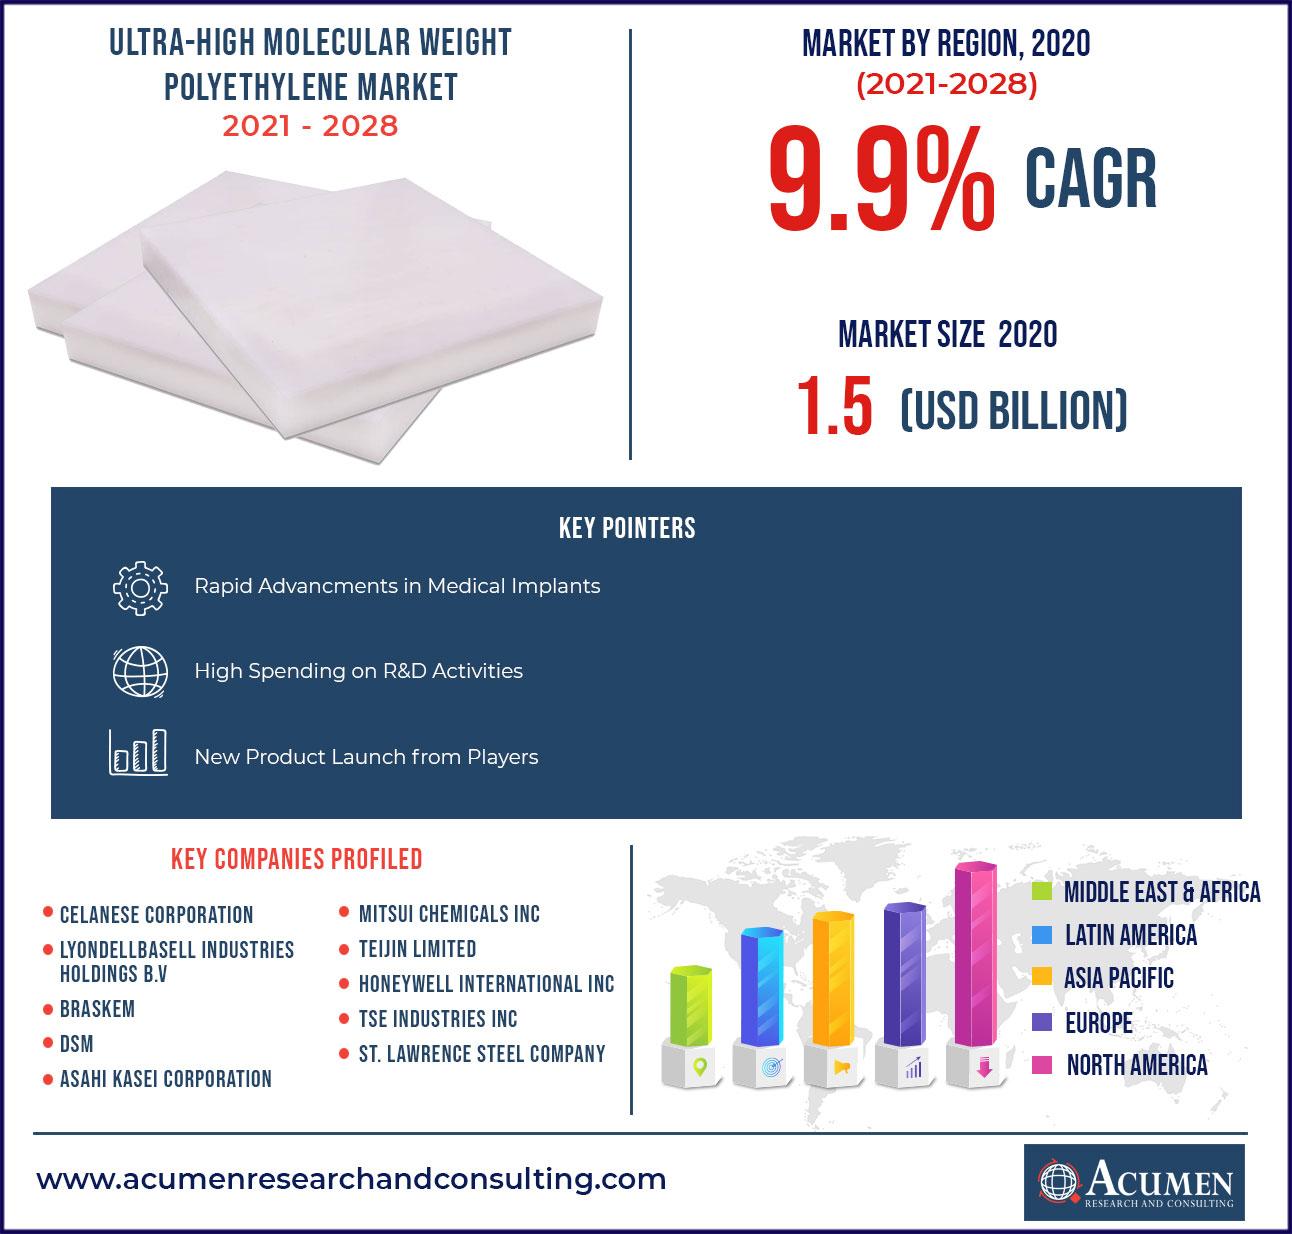 Ultra-High Molecular Weight Polyethylene Market - CAGR of 9.9% from 2021-2028